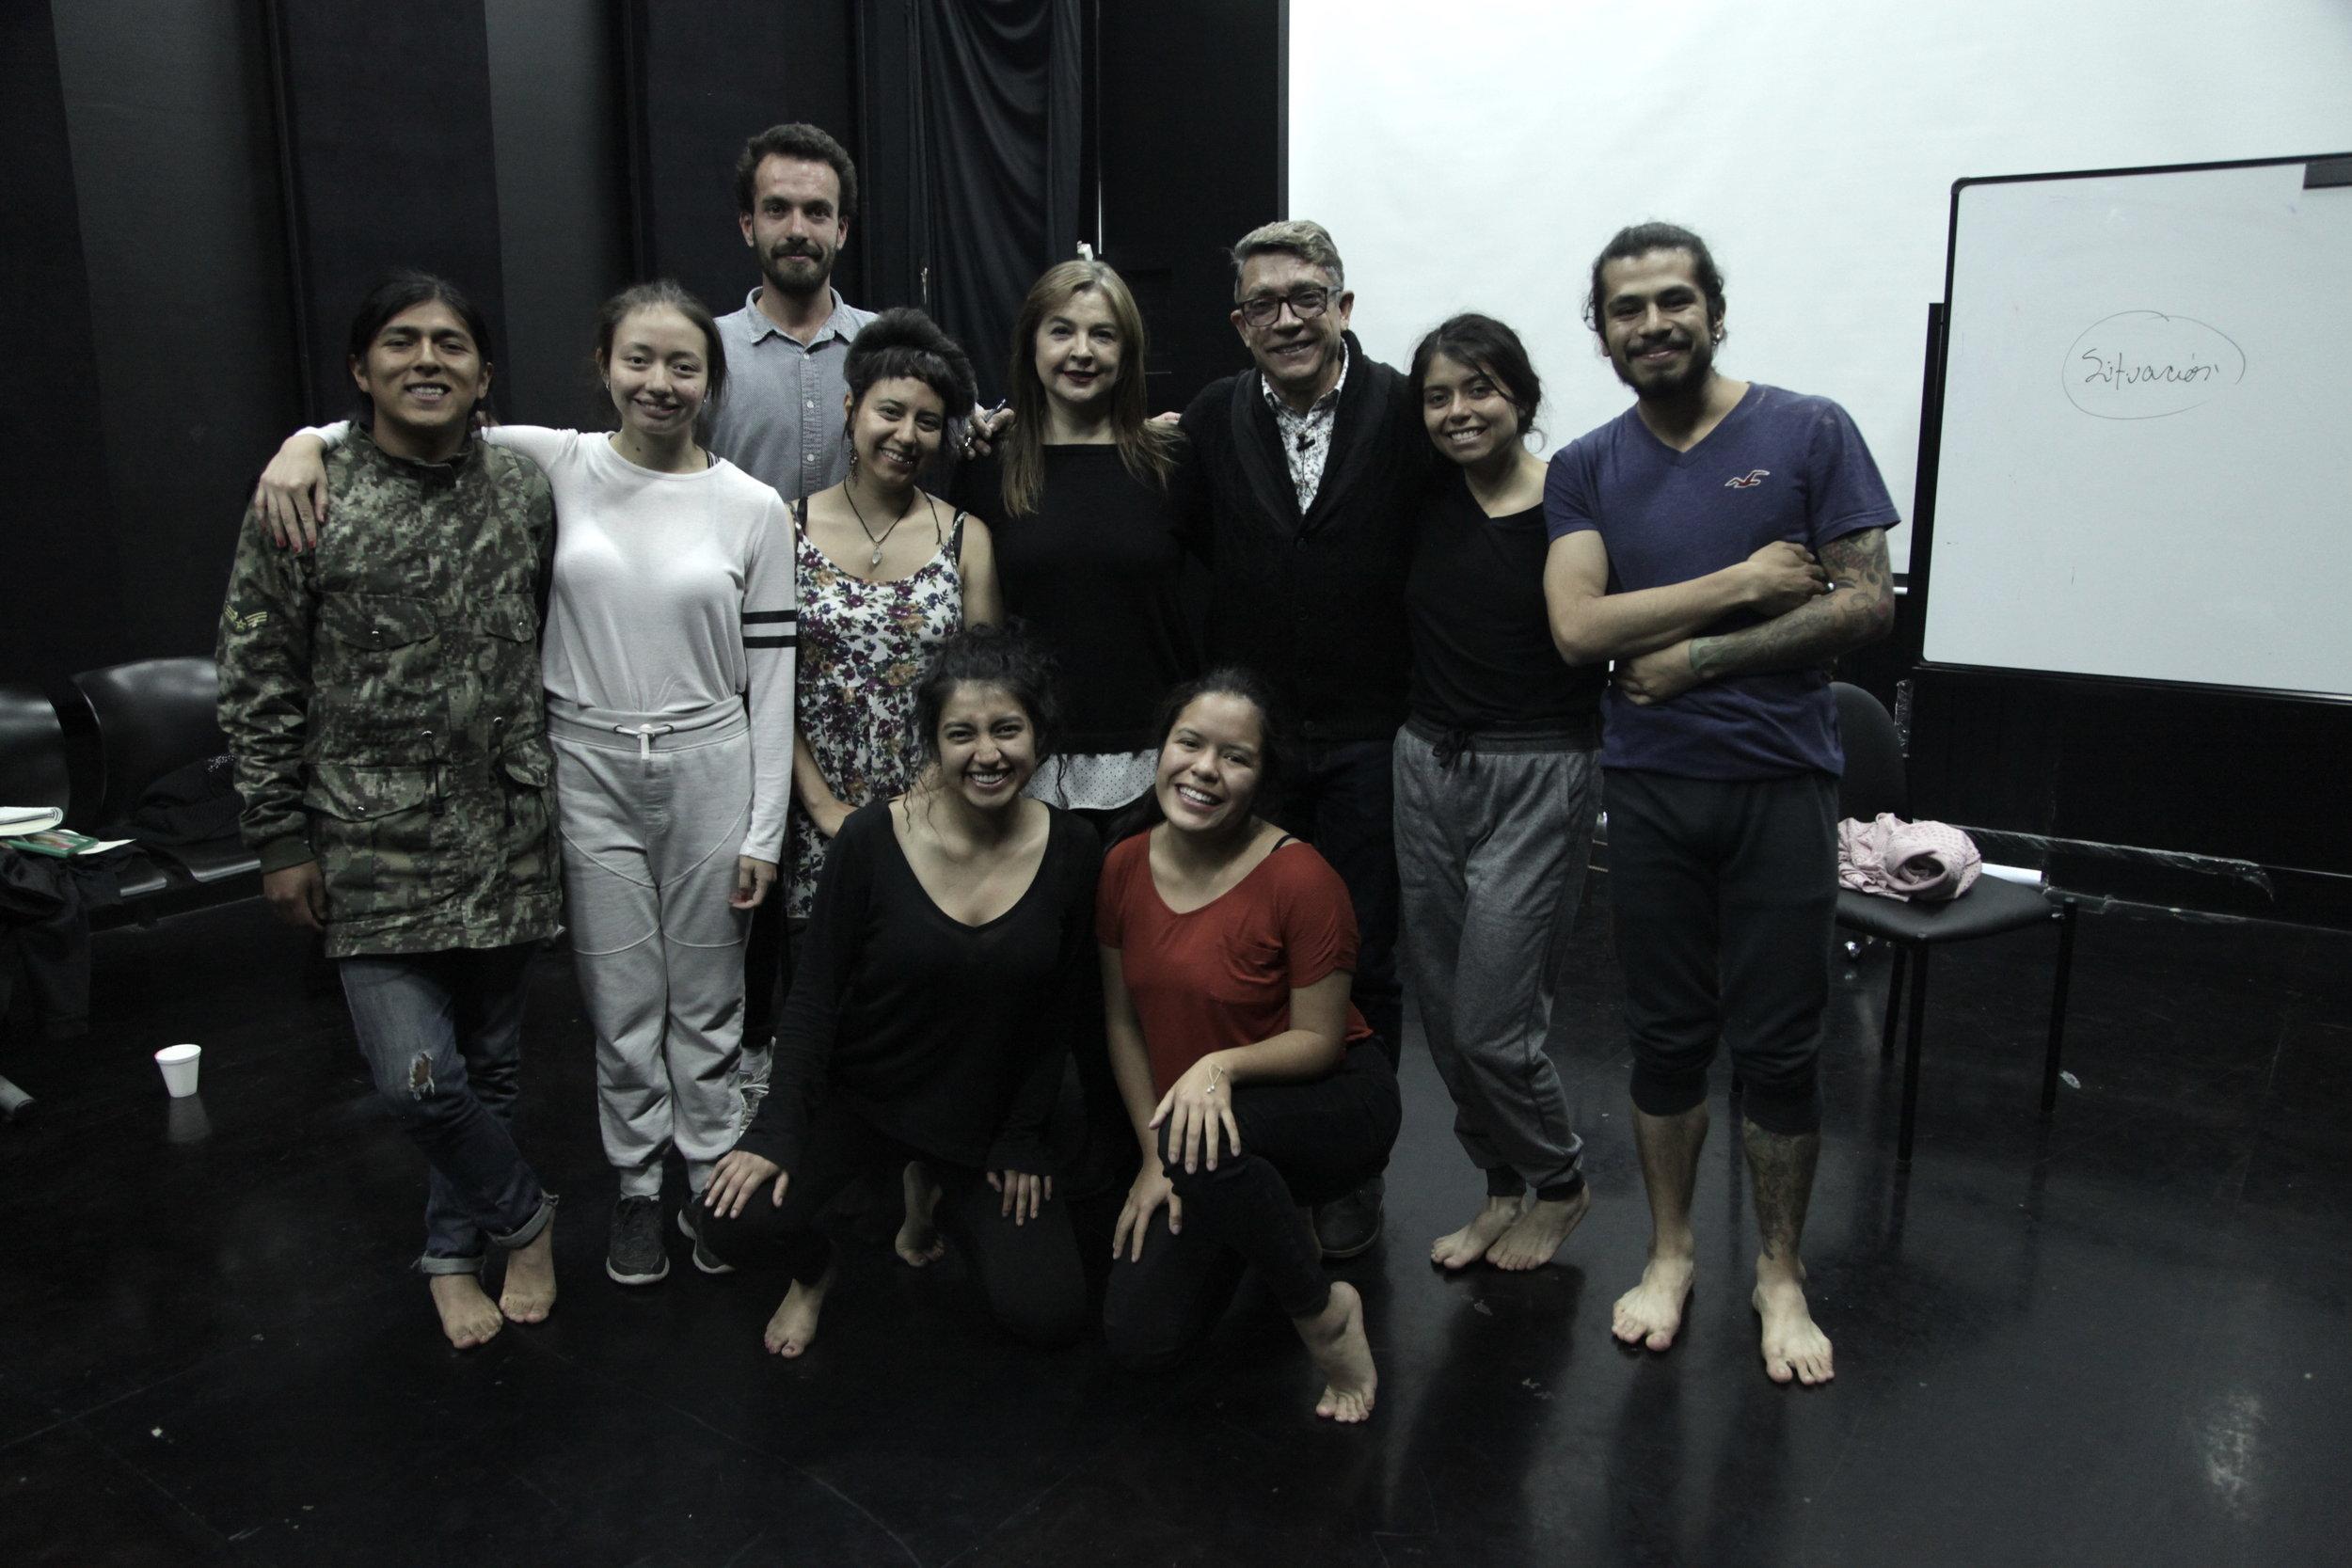 Taller sobre dramaturgia. Foto. Silvia Echevarria El Apuntador